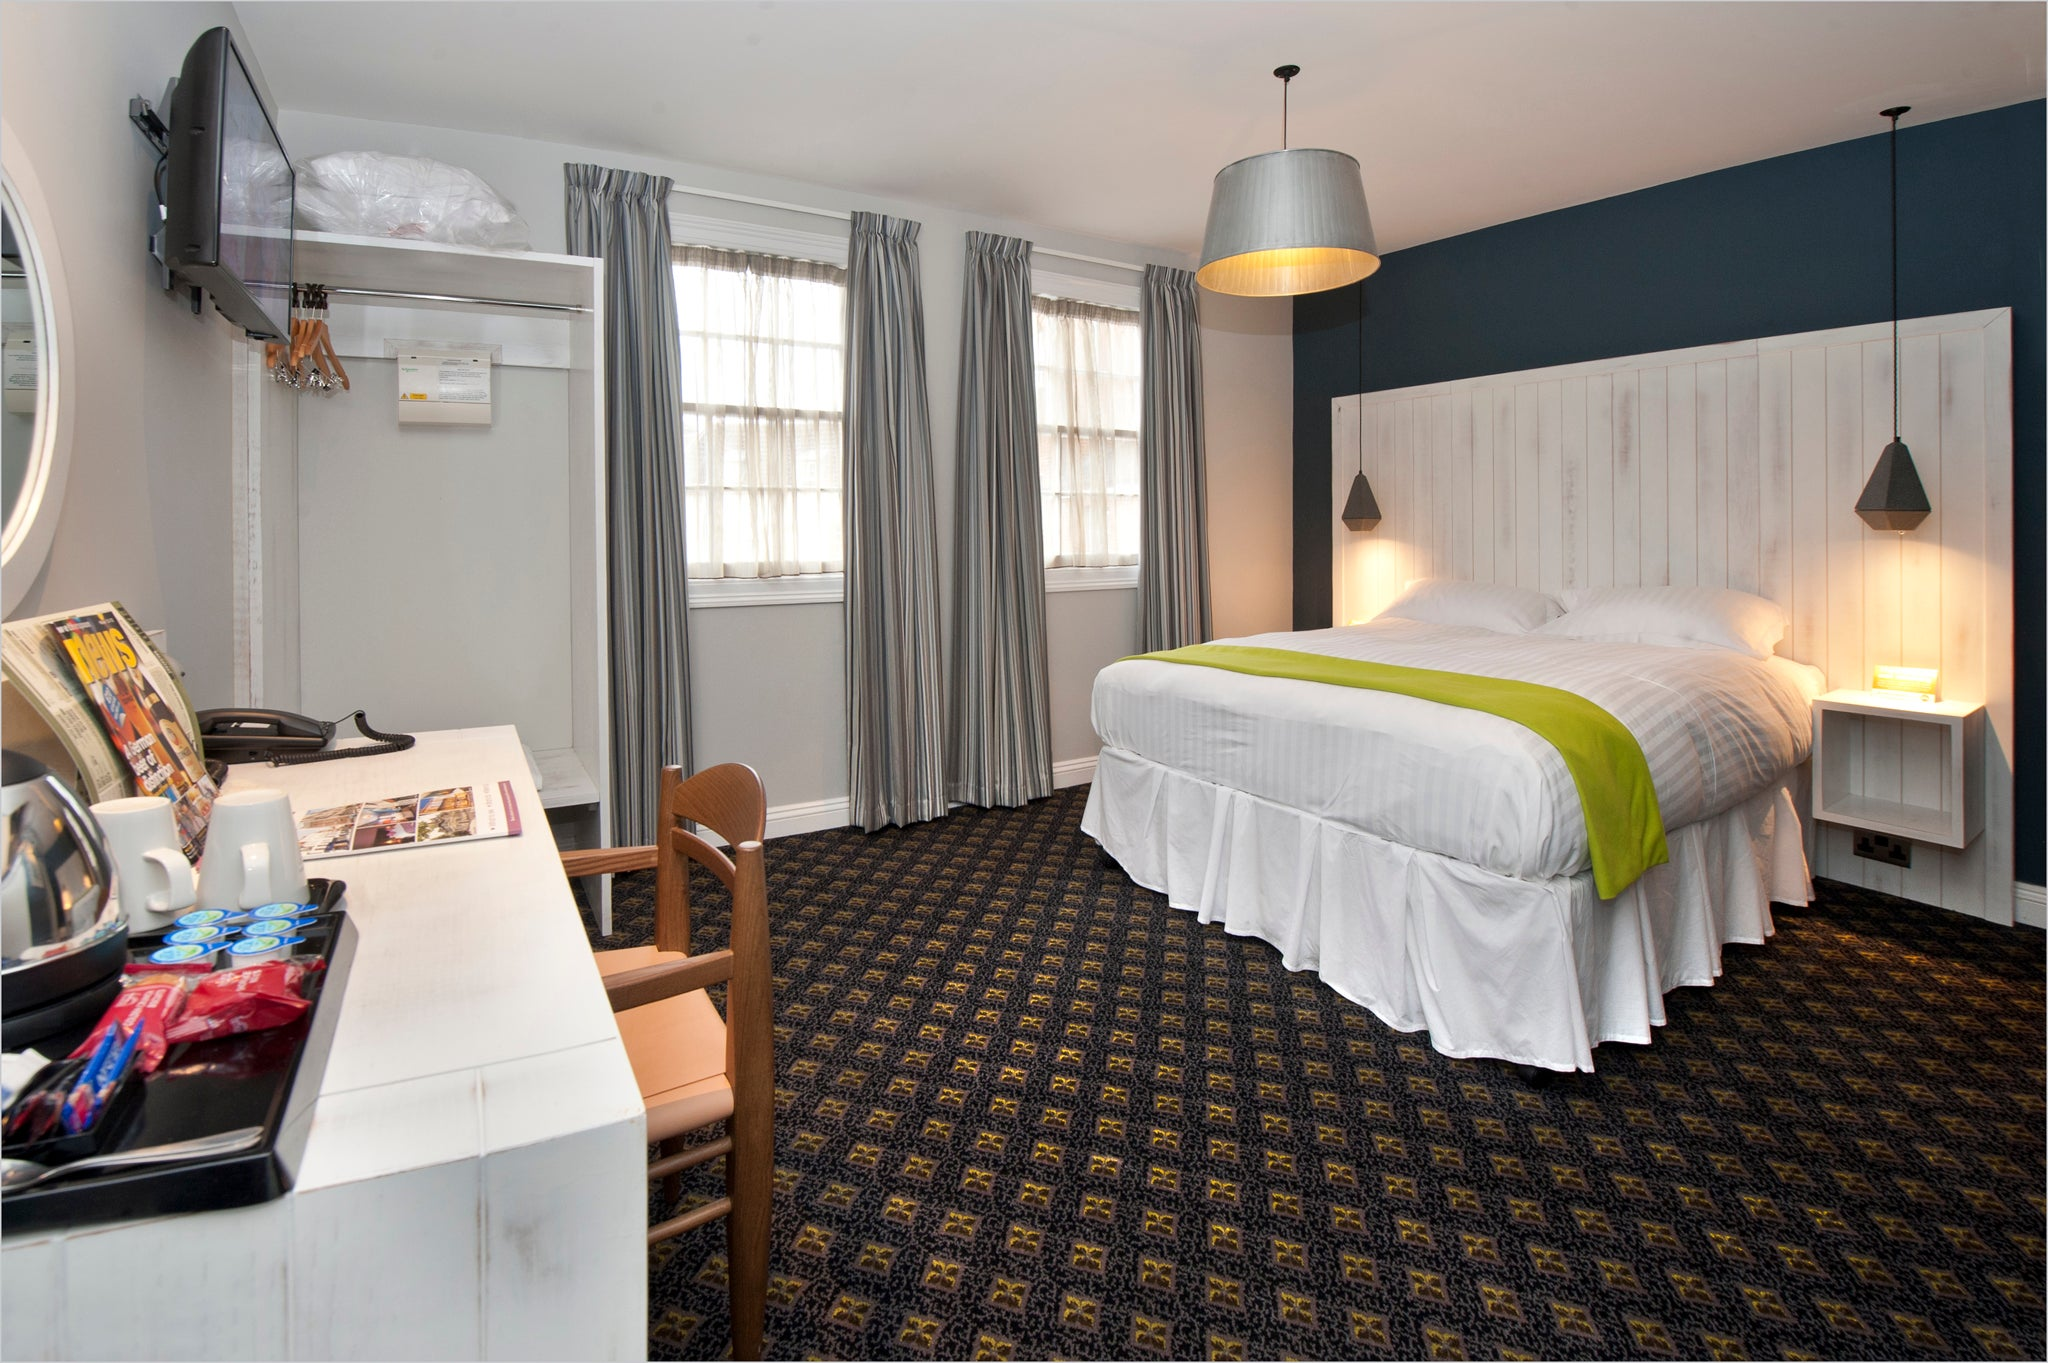 Image result for wetherspoons hotel